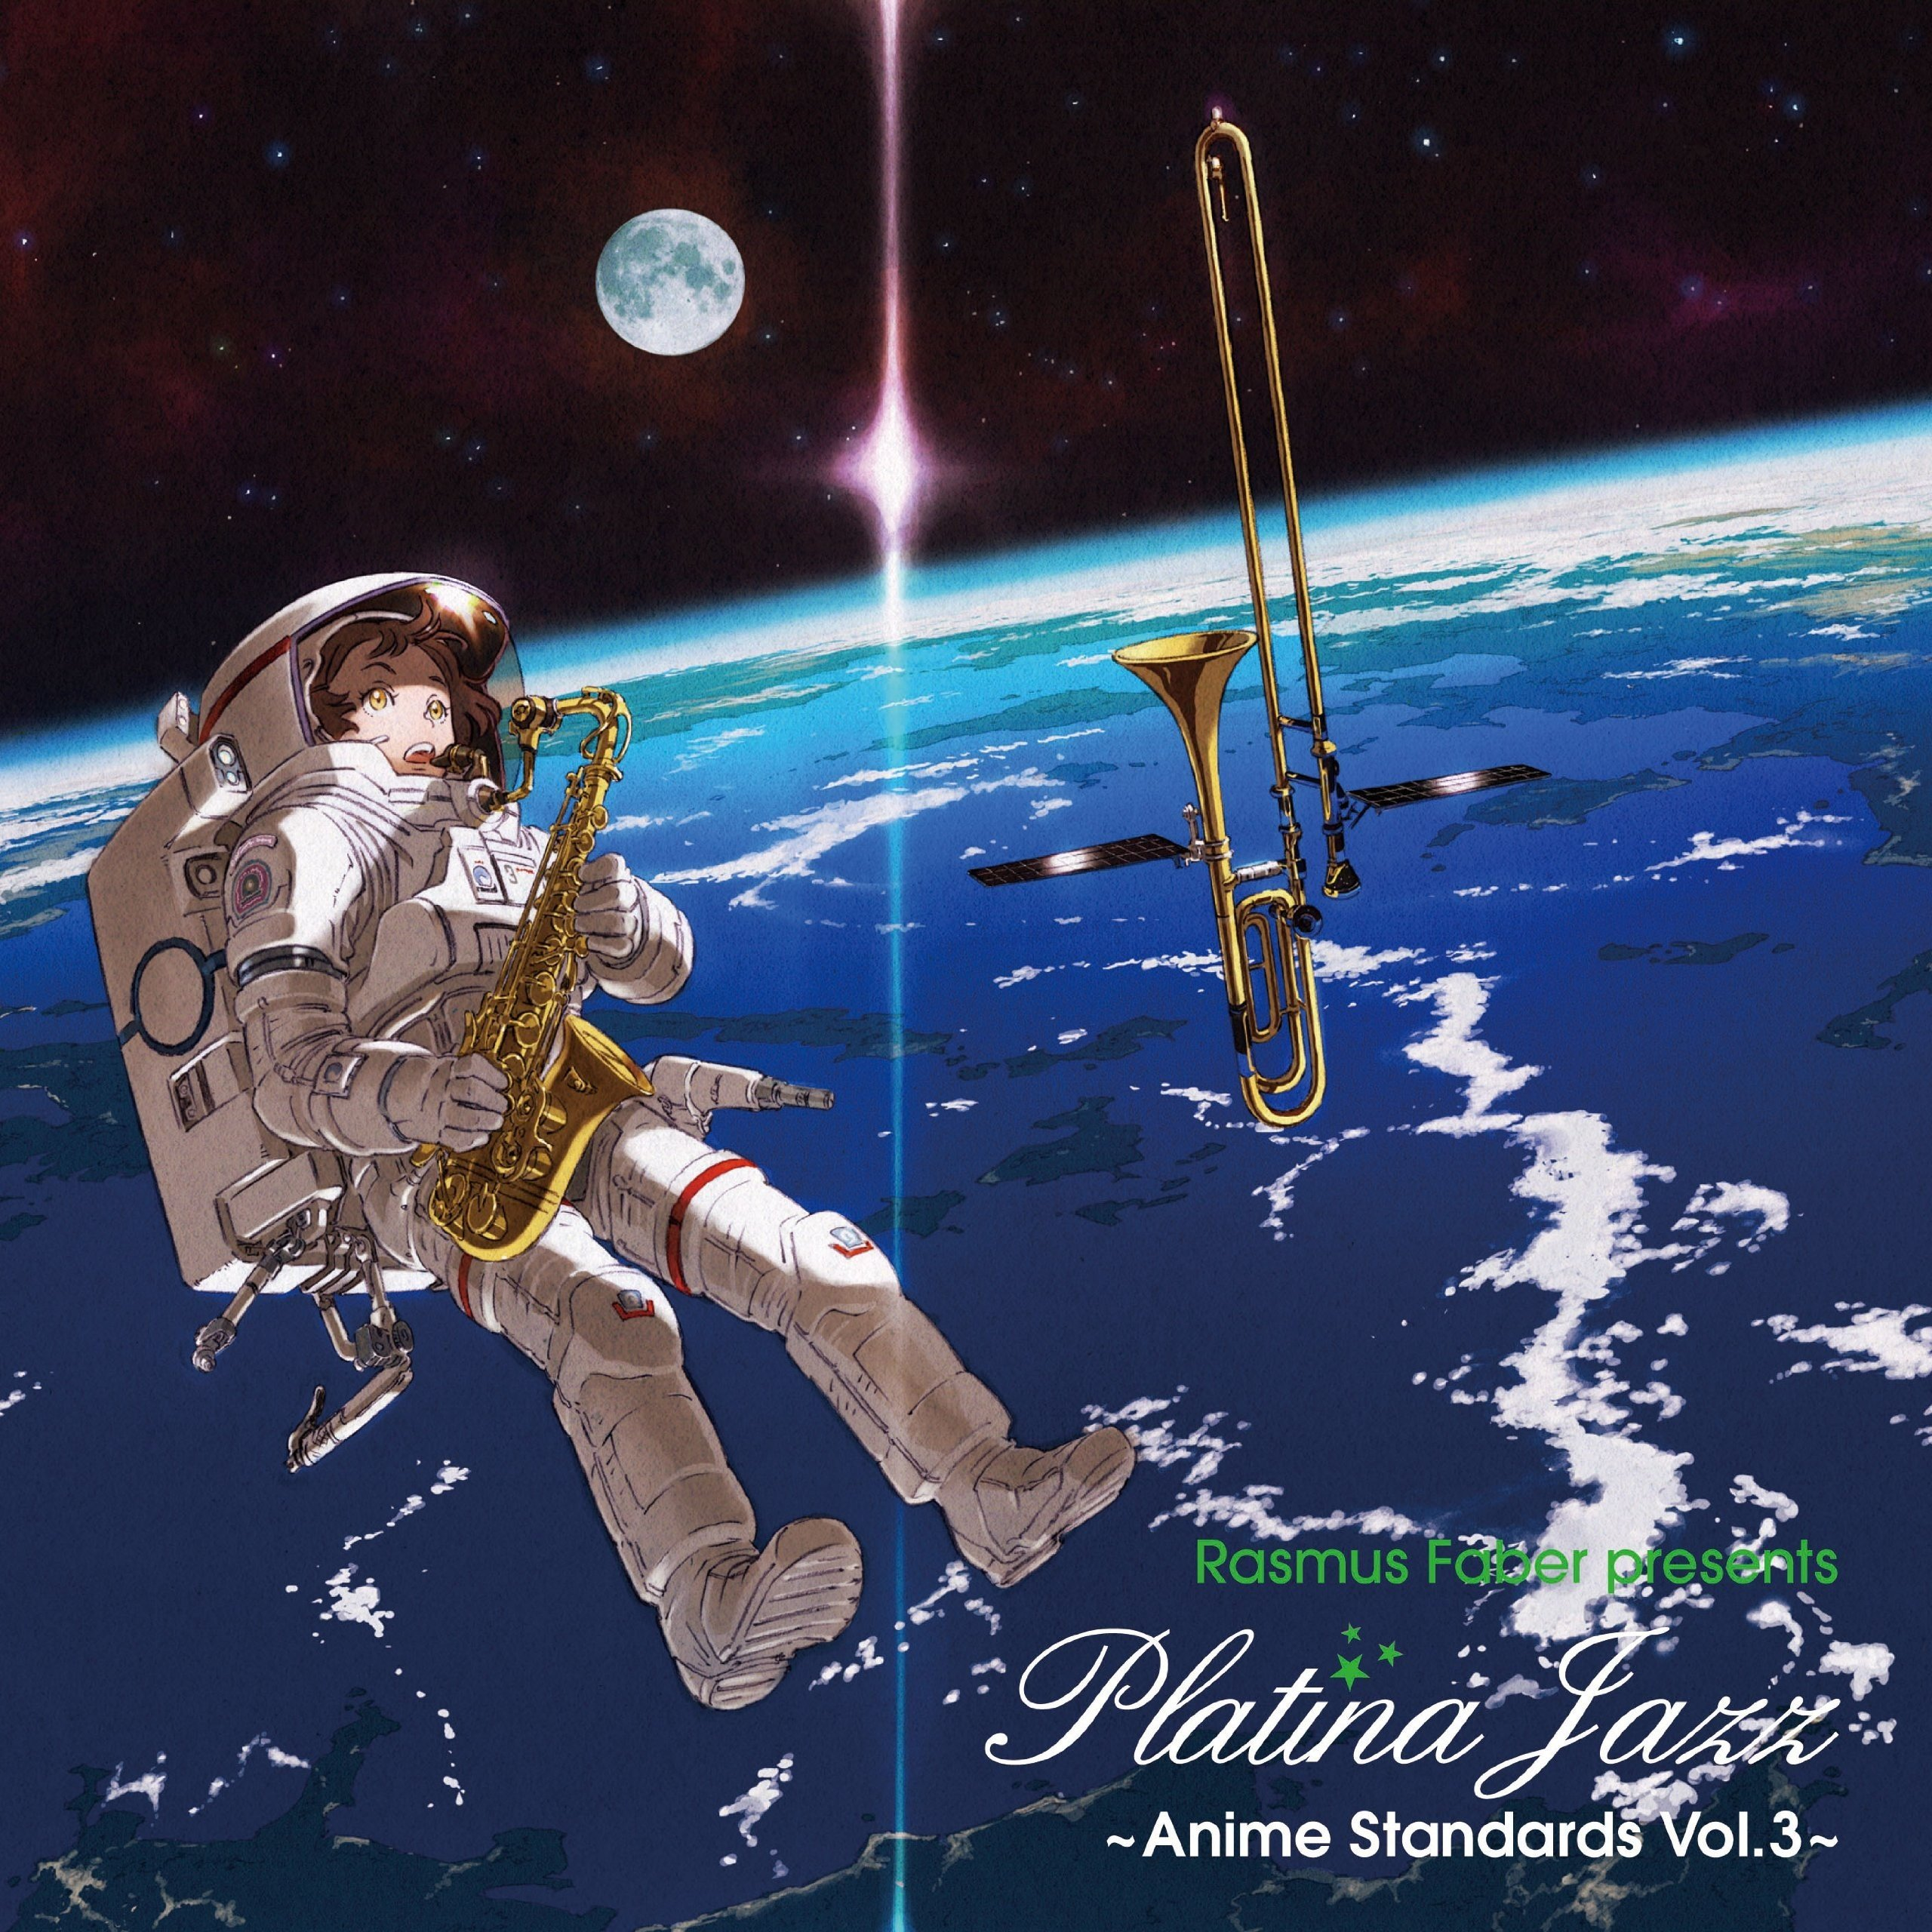 VA – Rasmus Faber Presents Platina Jazz – Anime Standards Vol. 3 [FLAC / 24bit Lossless / WEB] [2012.02.08]